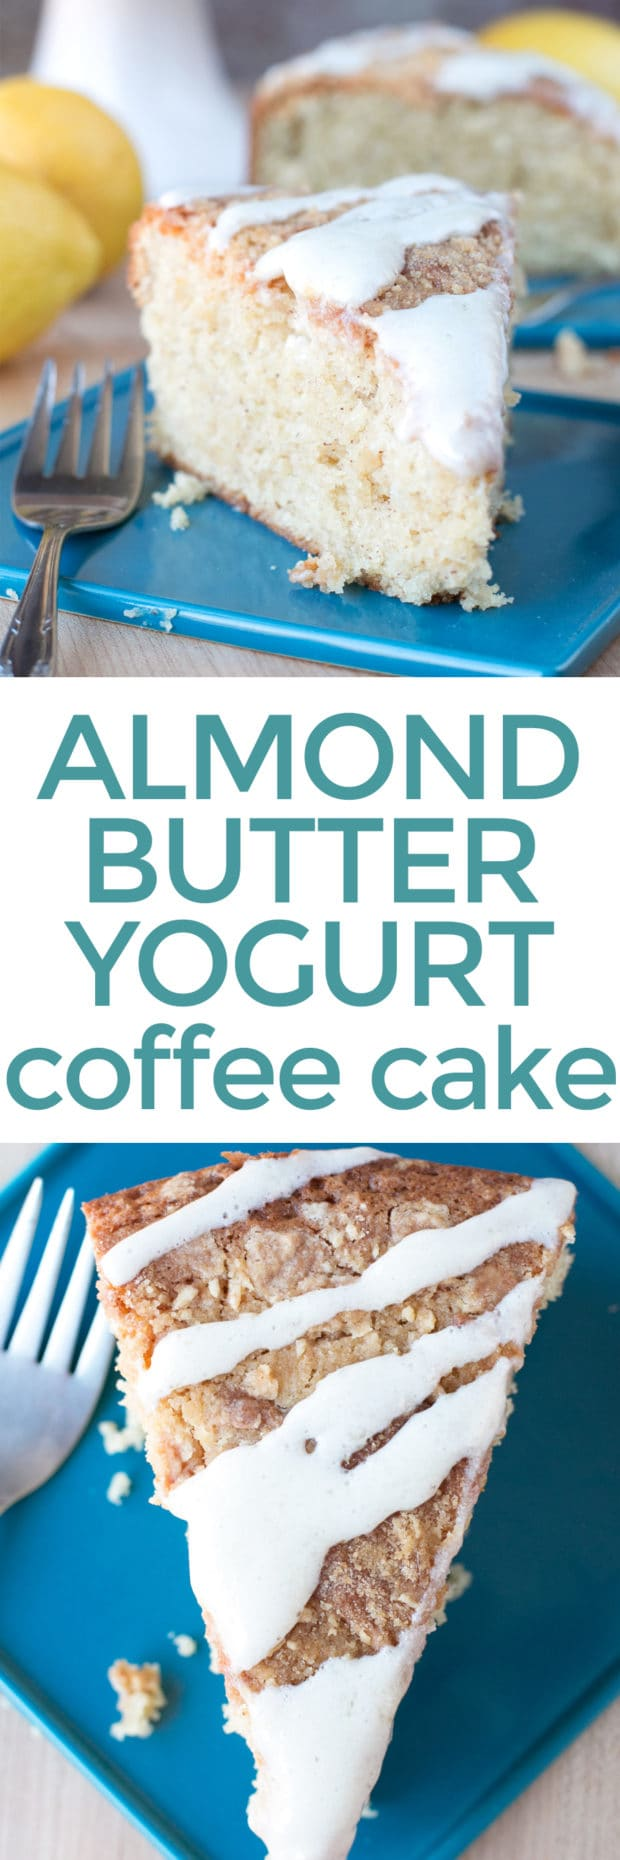 Almond Butter Yogurt Coffee Cake – Cake 'n Knife